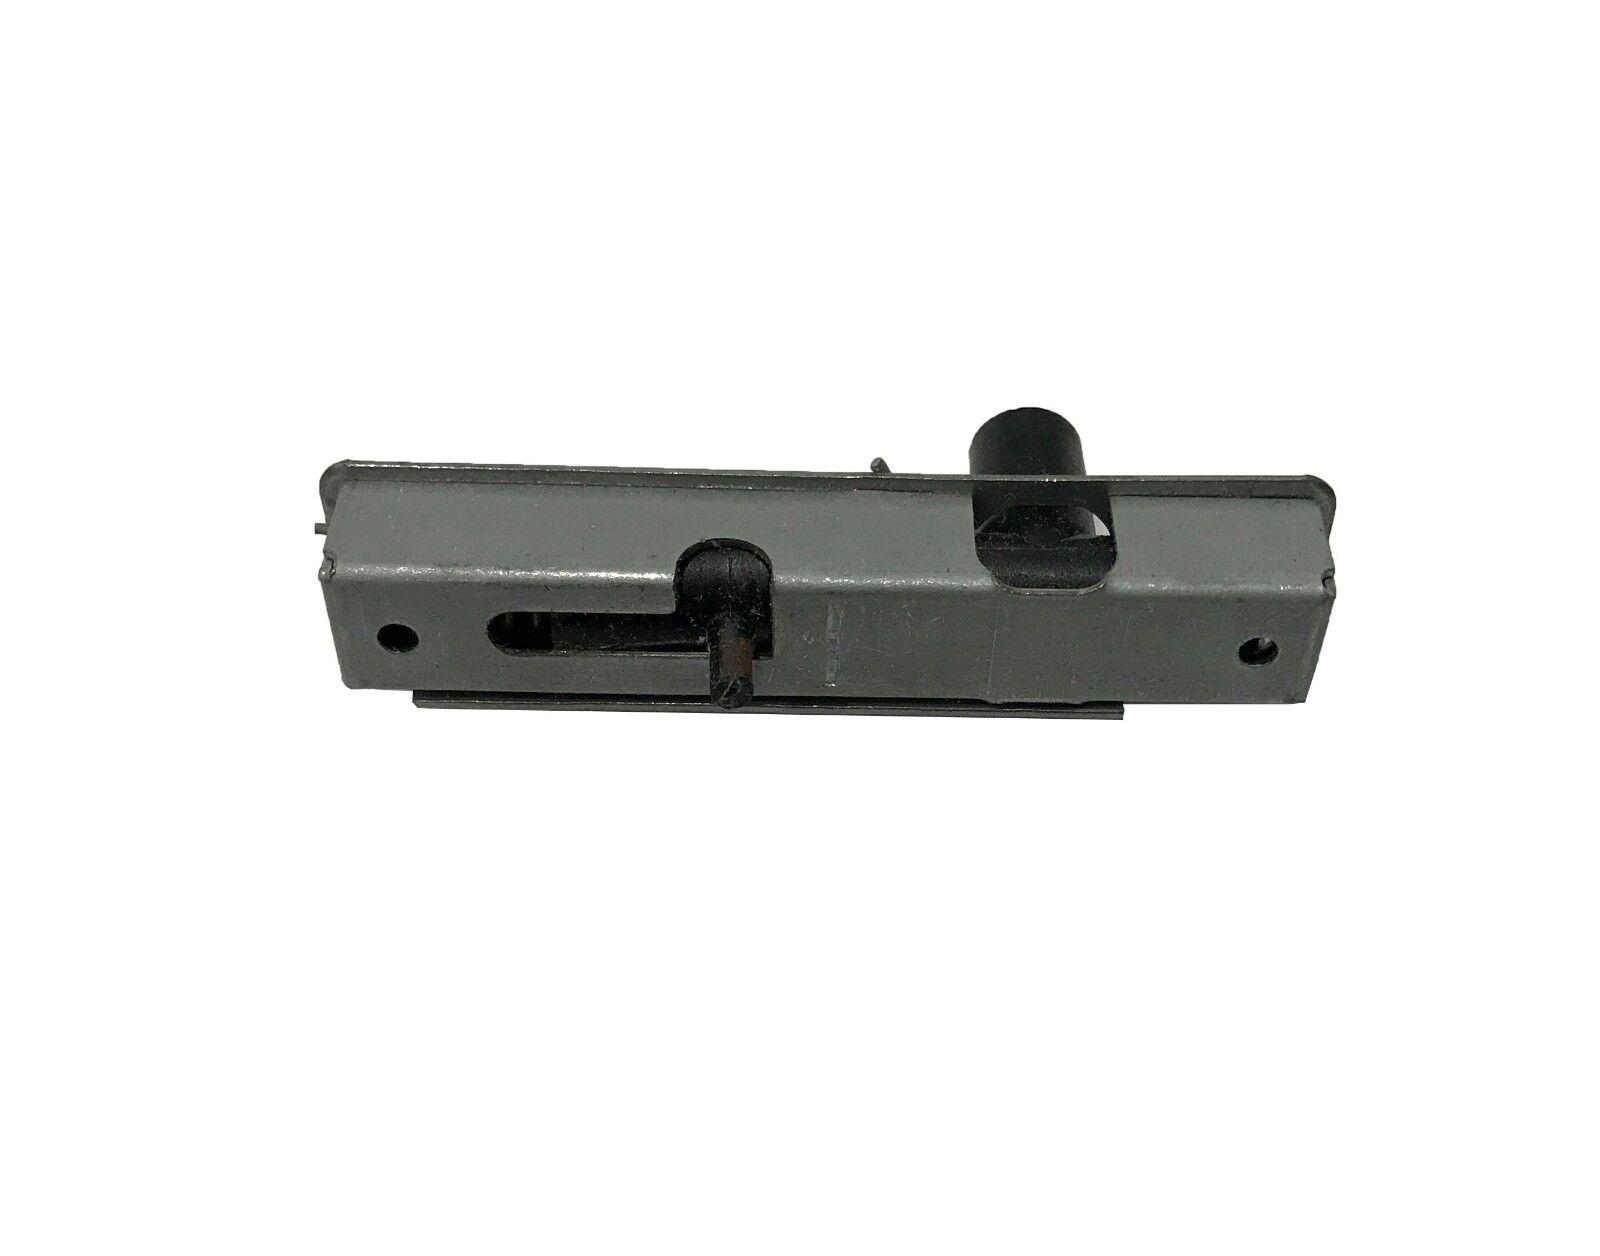 Cannon C00147318 Gaskamin Piezo Ign Jc1284v Jc1284v Jc1284v J00027243 d82a22